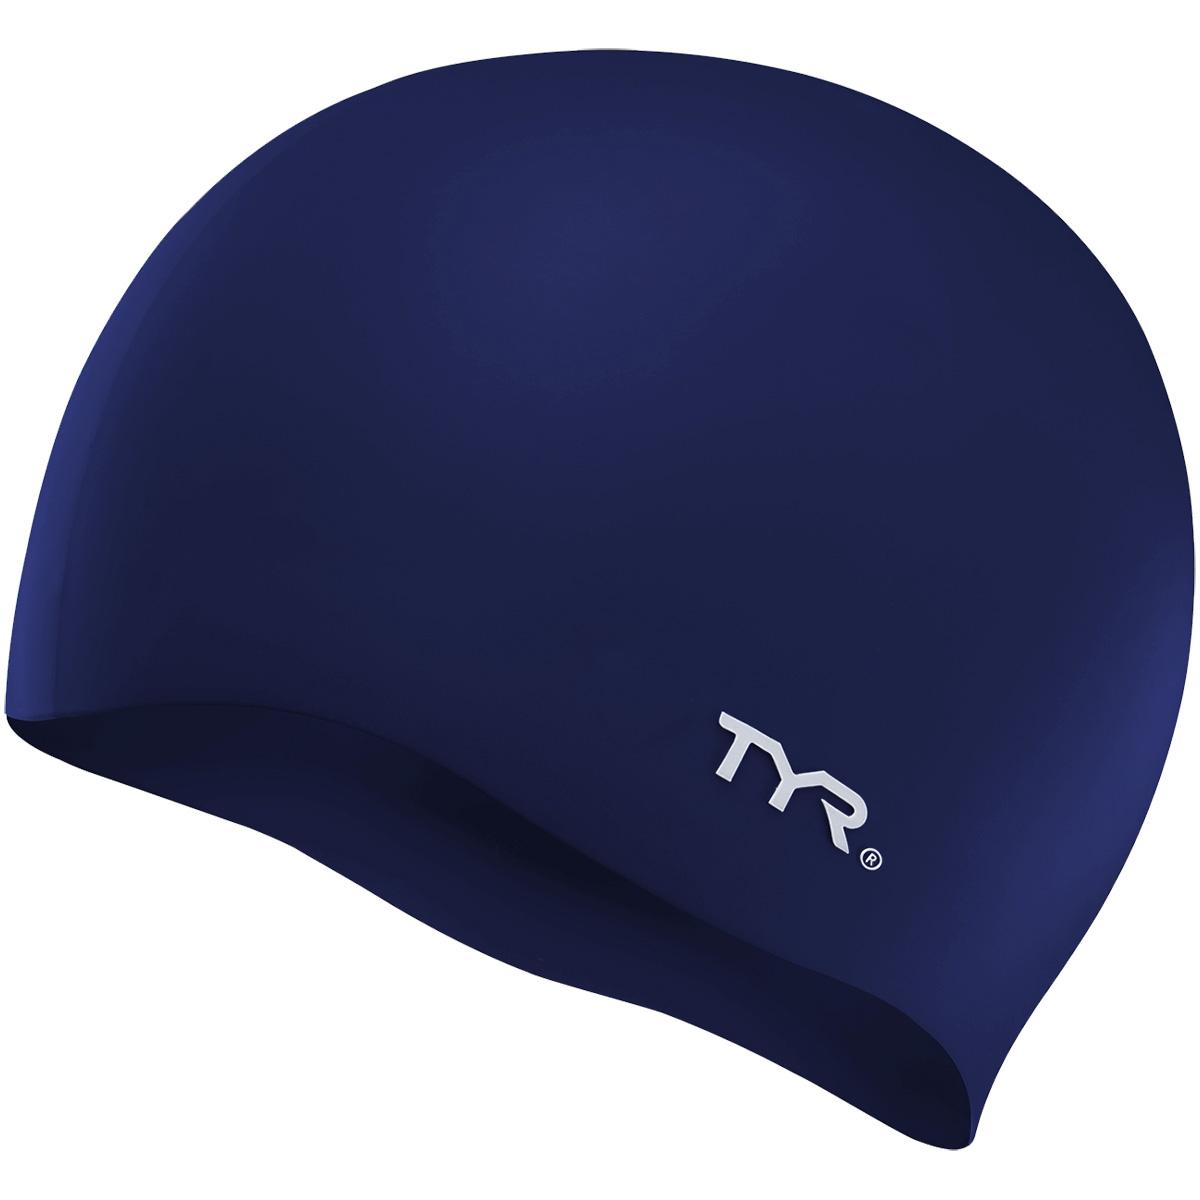 Produktbild von TYR Wrinkle-Free Silicone Adult Fit Badekappe - navy